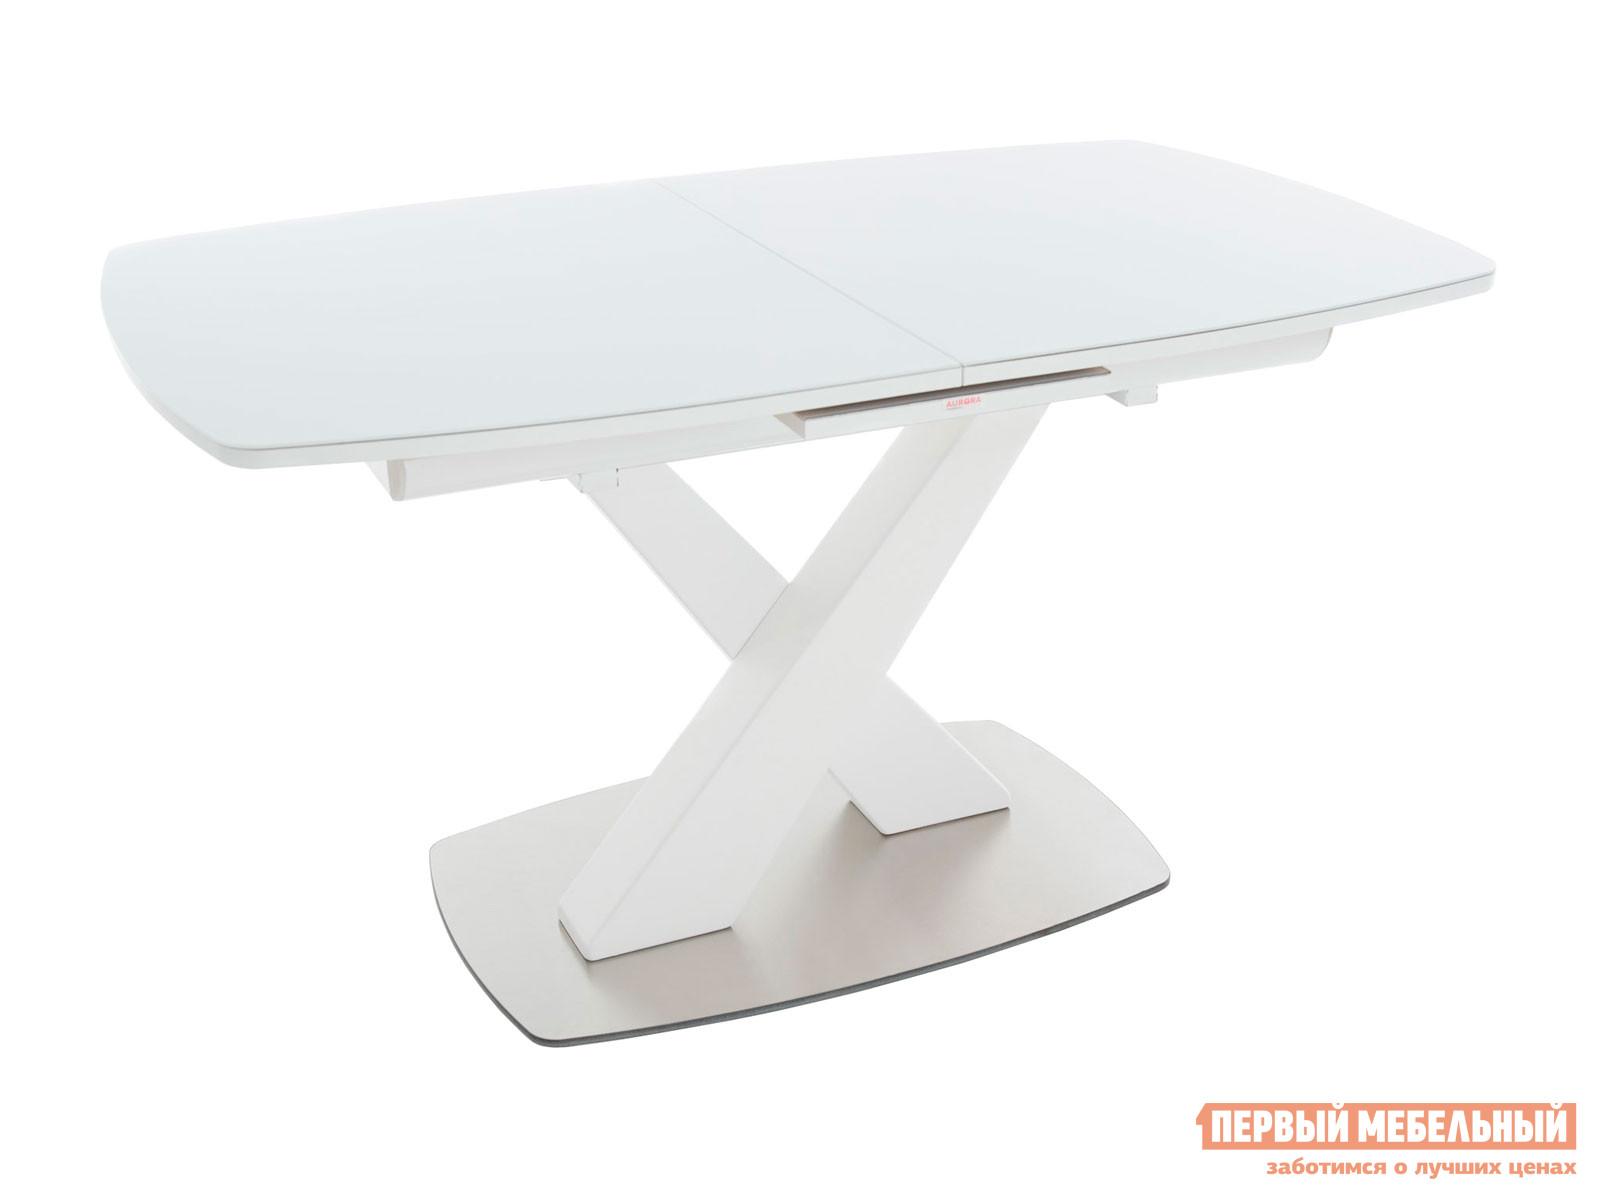 Кухонный стол  Орлеан Белый / Стекло Белое глянцевое Мебвилл 118544